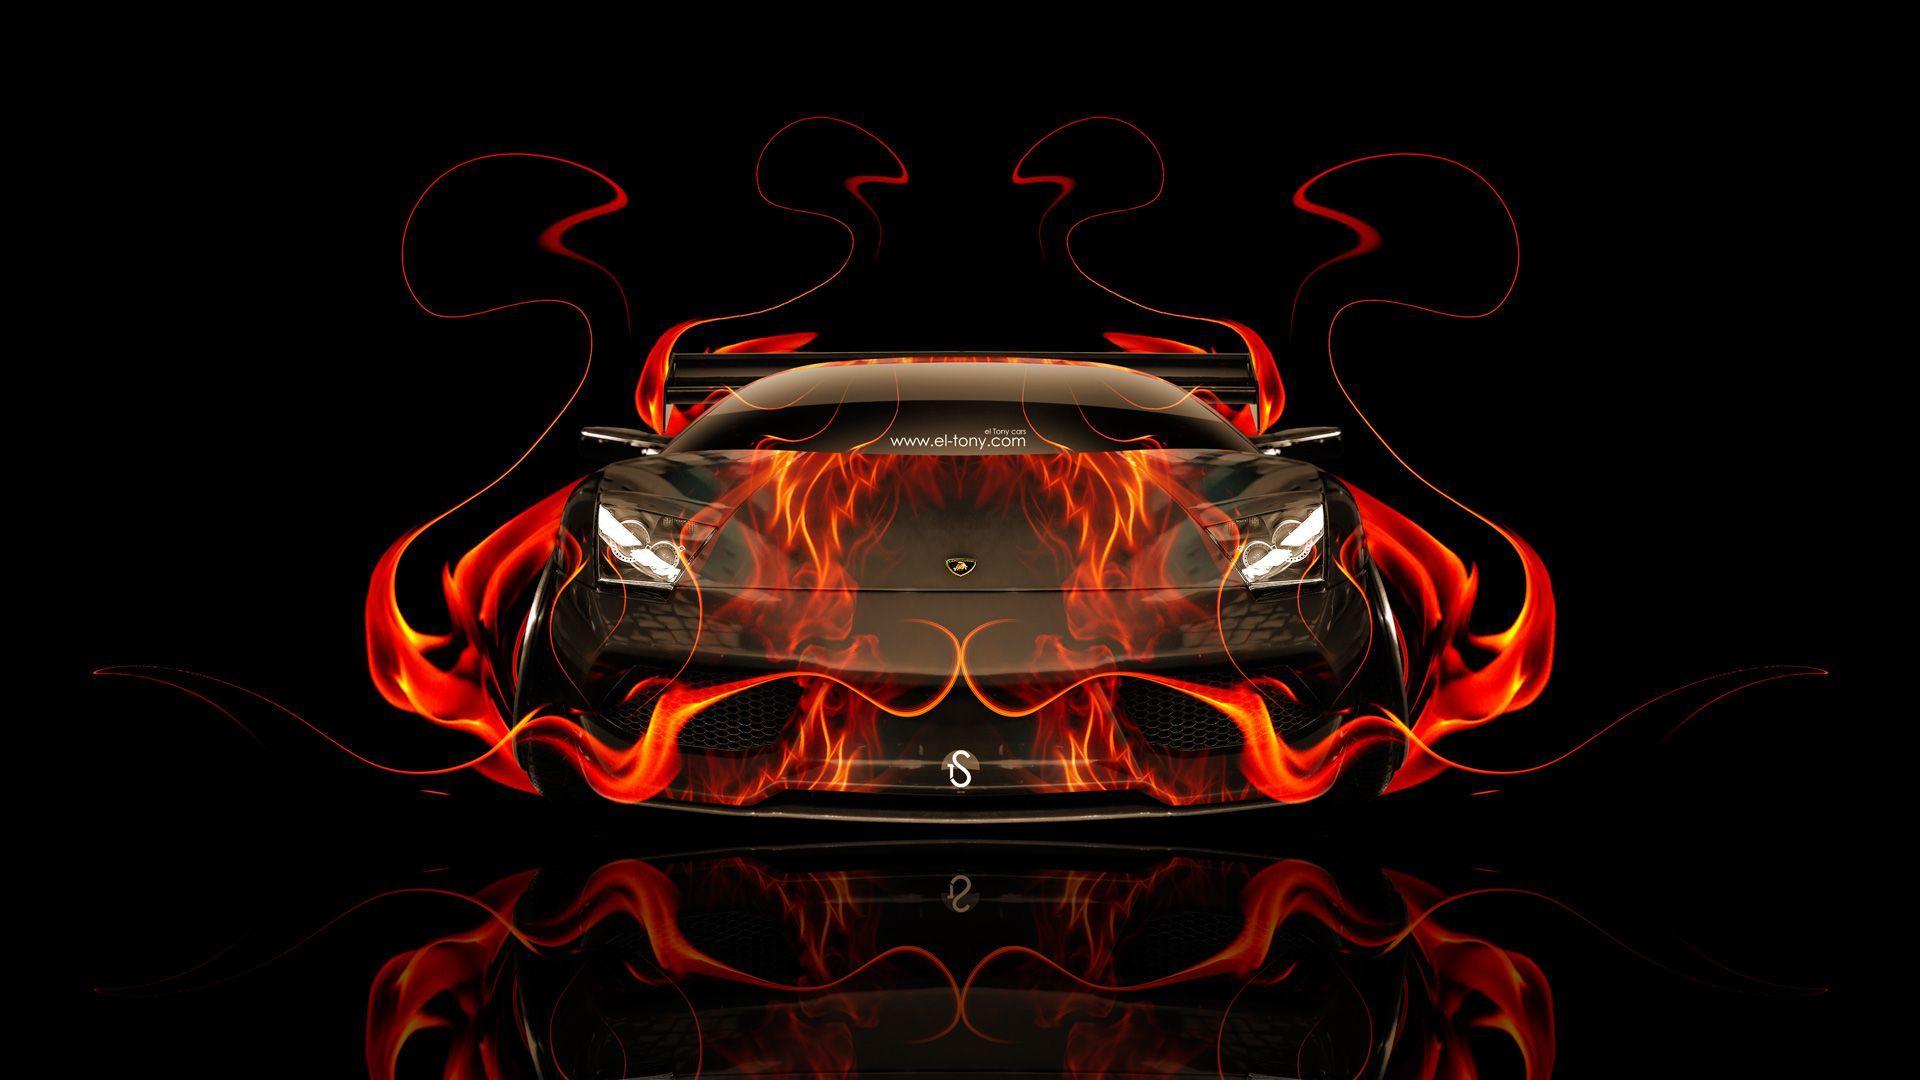 Neon Bugatti Wallpapers Top Free Neon Bugatti Backgrounds Wallpaperaccess